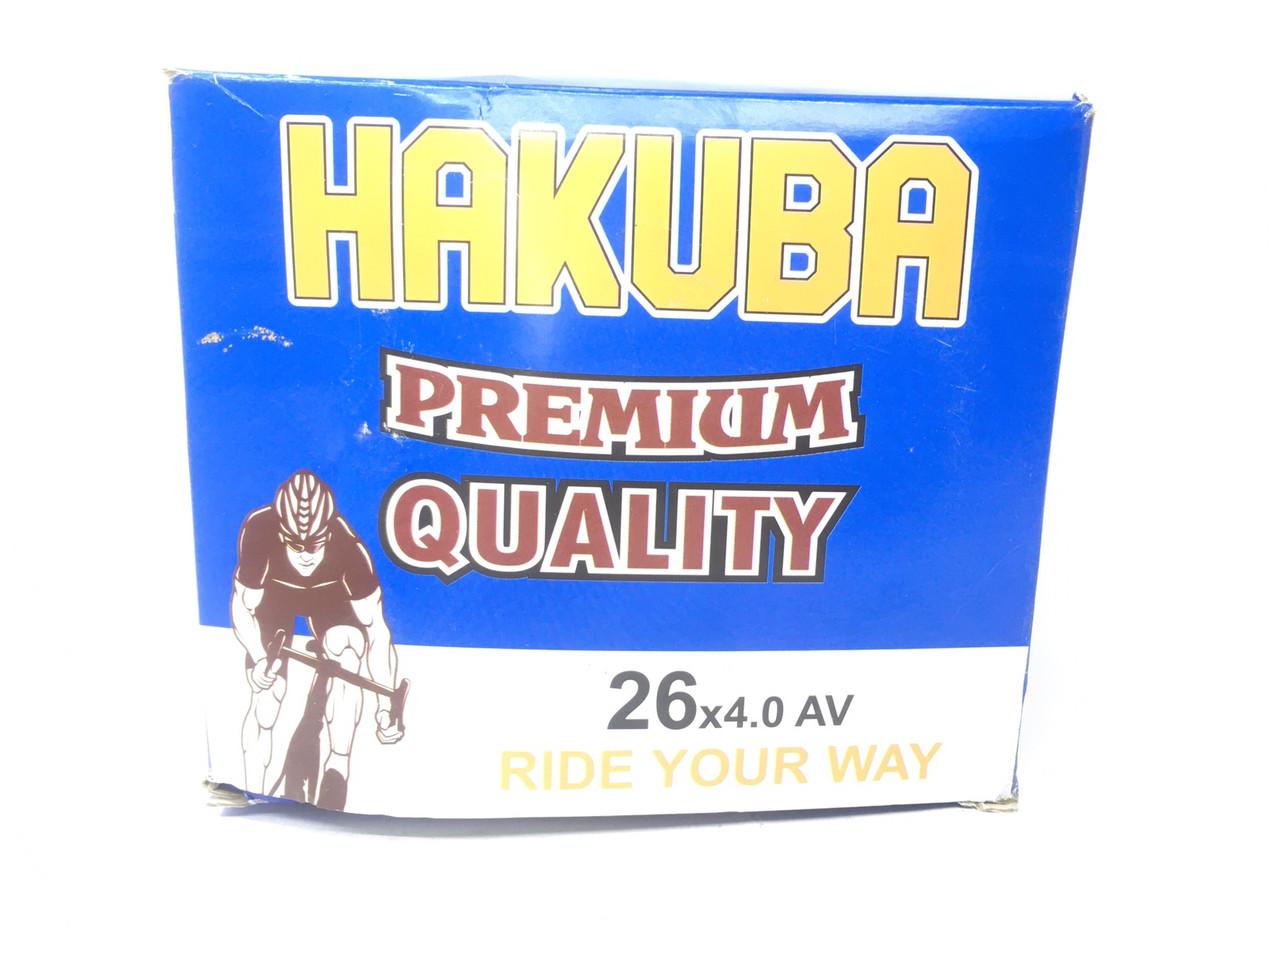 Камера на фэтбайк FatBike Hakuba 26 x 4.0 AV